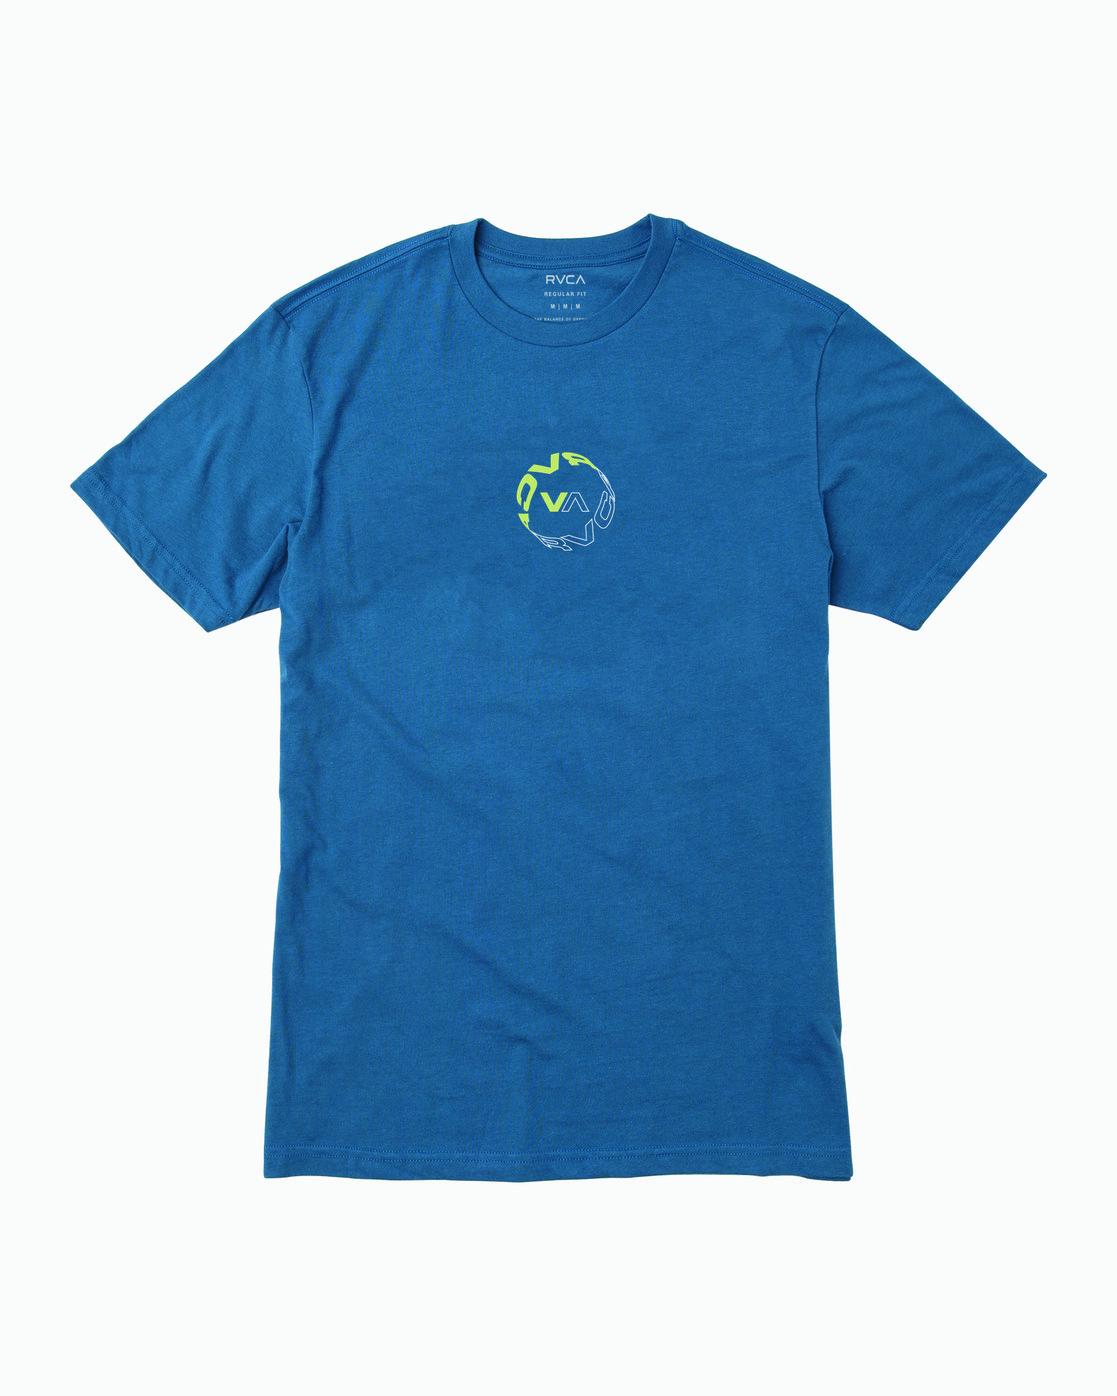 0 INFINITY T-SHIRT Blue M4011RIN RVCA